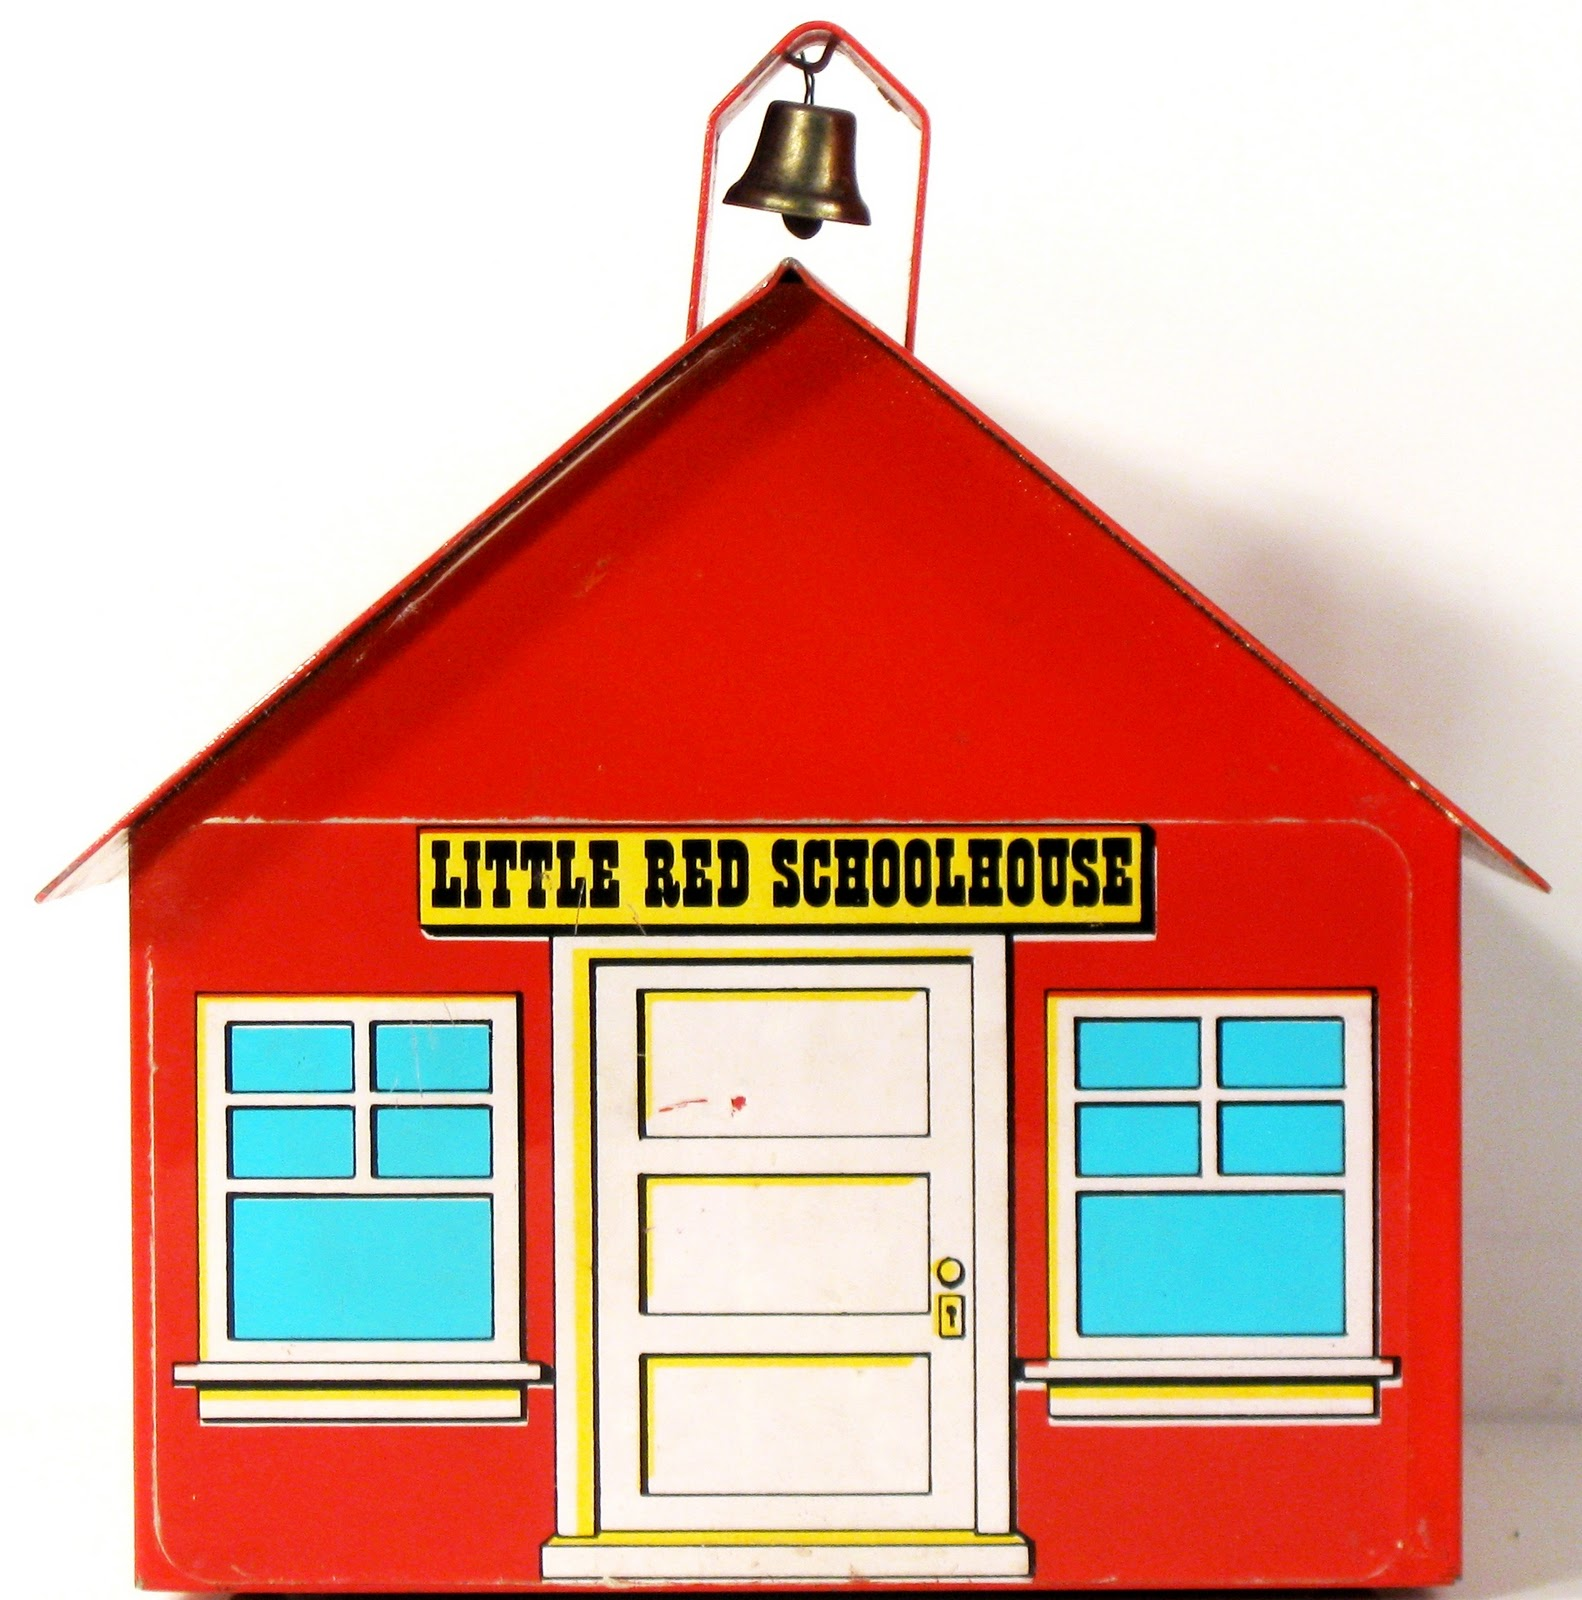 Little School House School House Cartoon Red